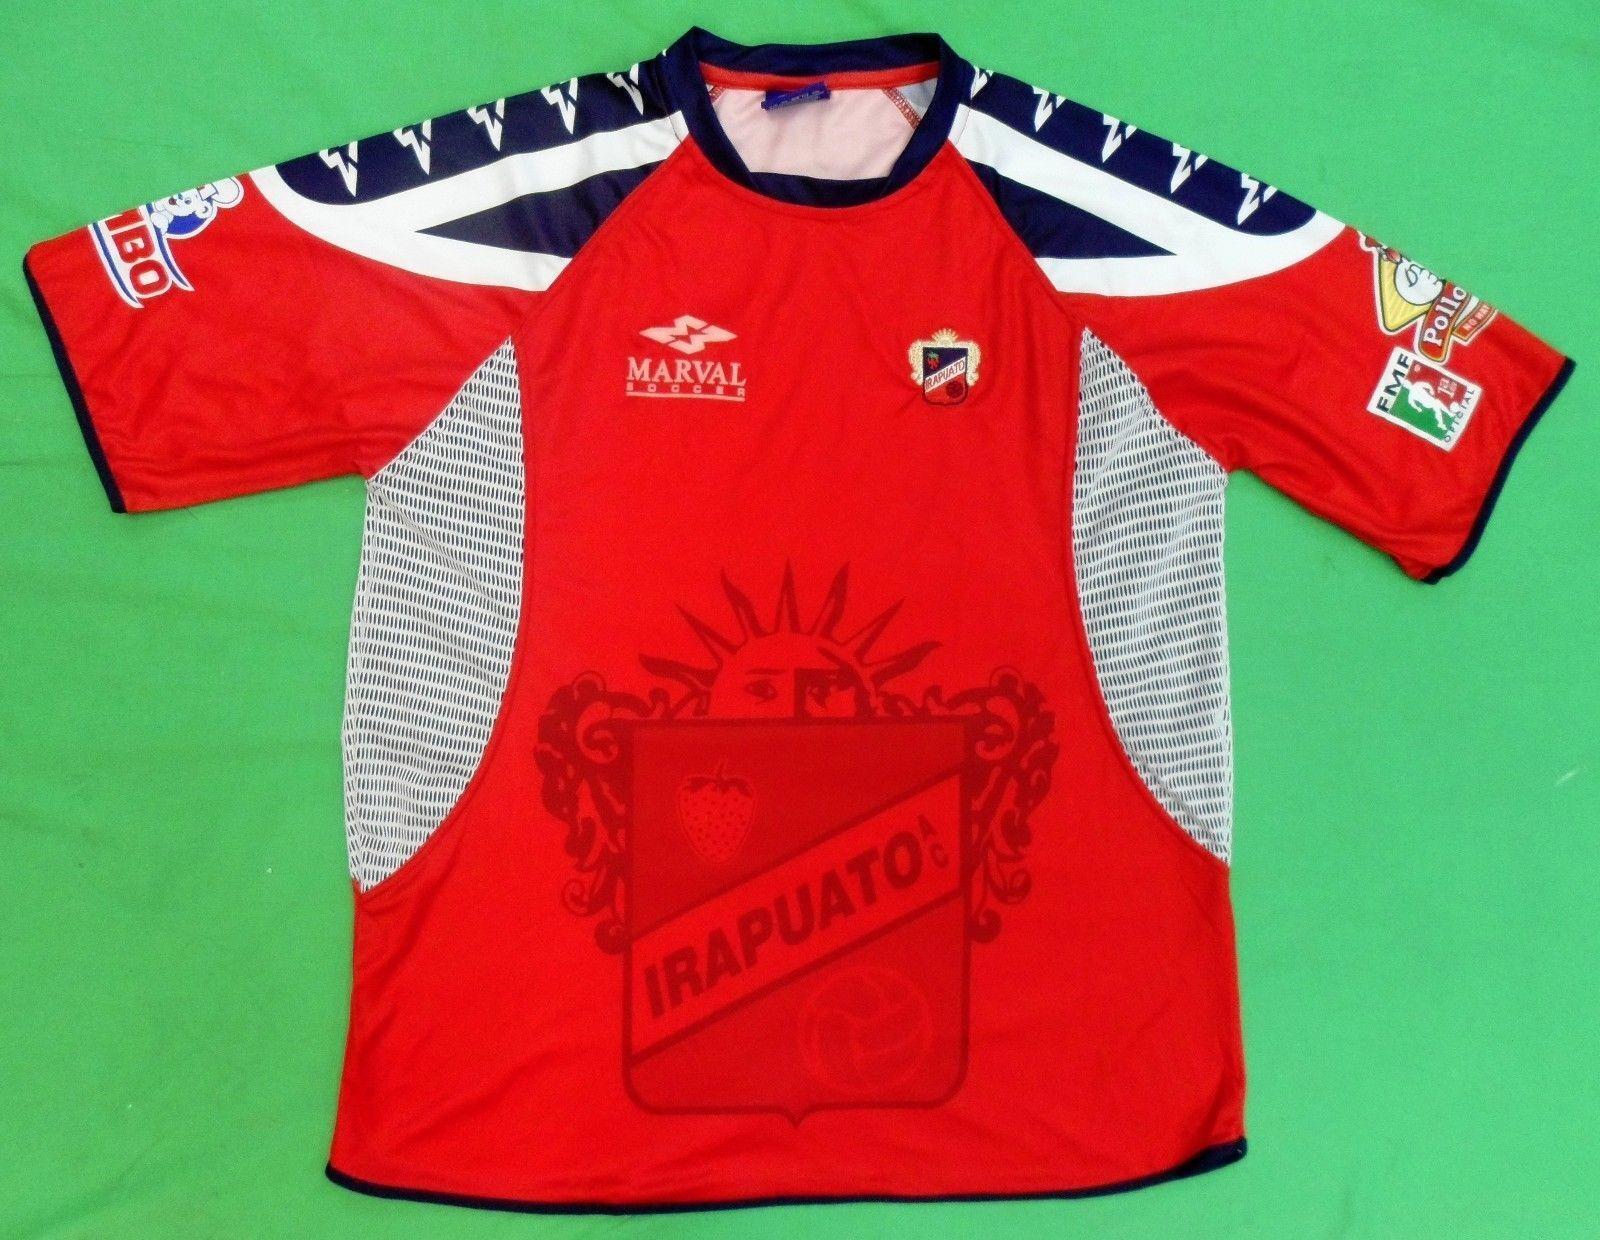 Original Authentic Marval Classic Irapuato F.C Home Jersey